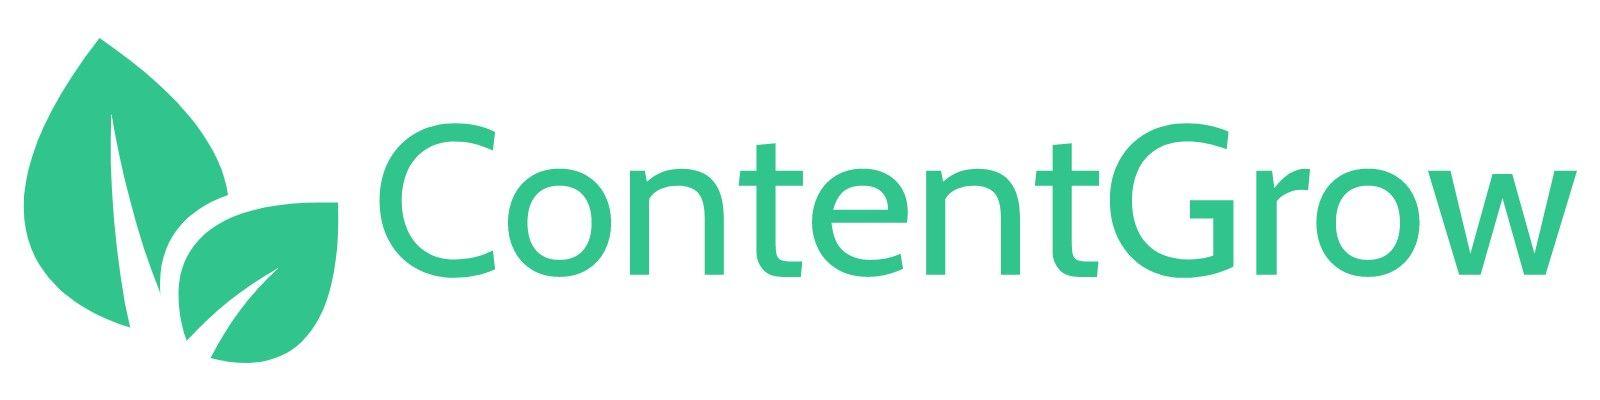 freelance writing jobs - contentgrow